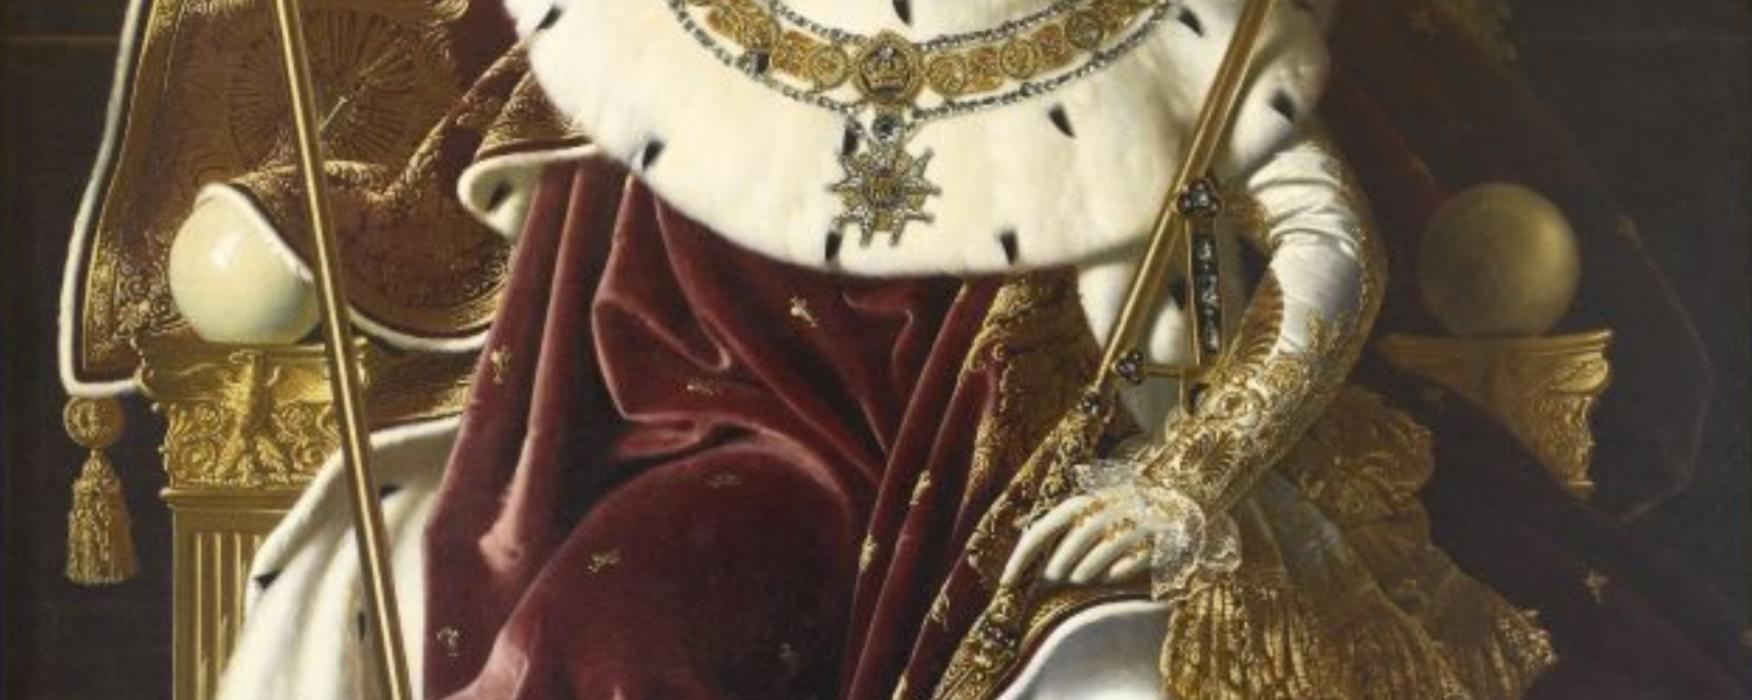 Ingres, il classico rivoluzionario